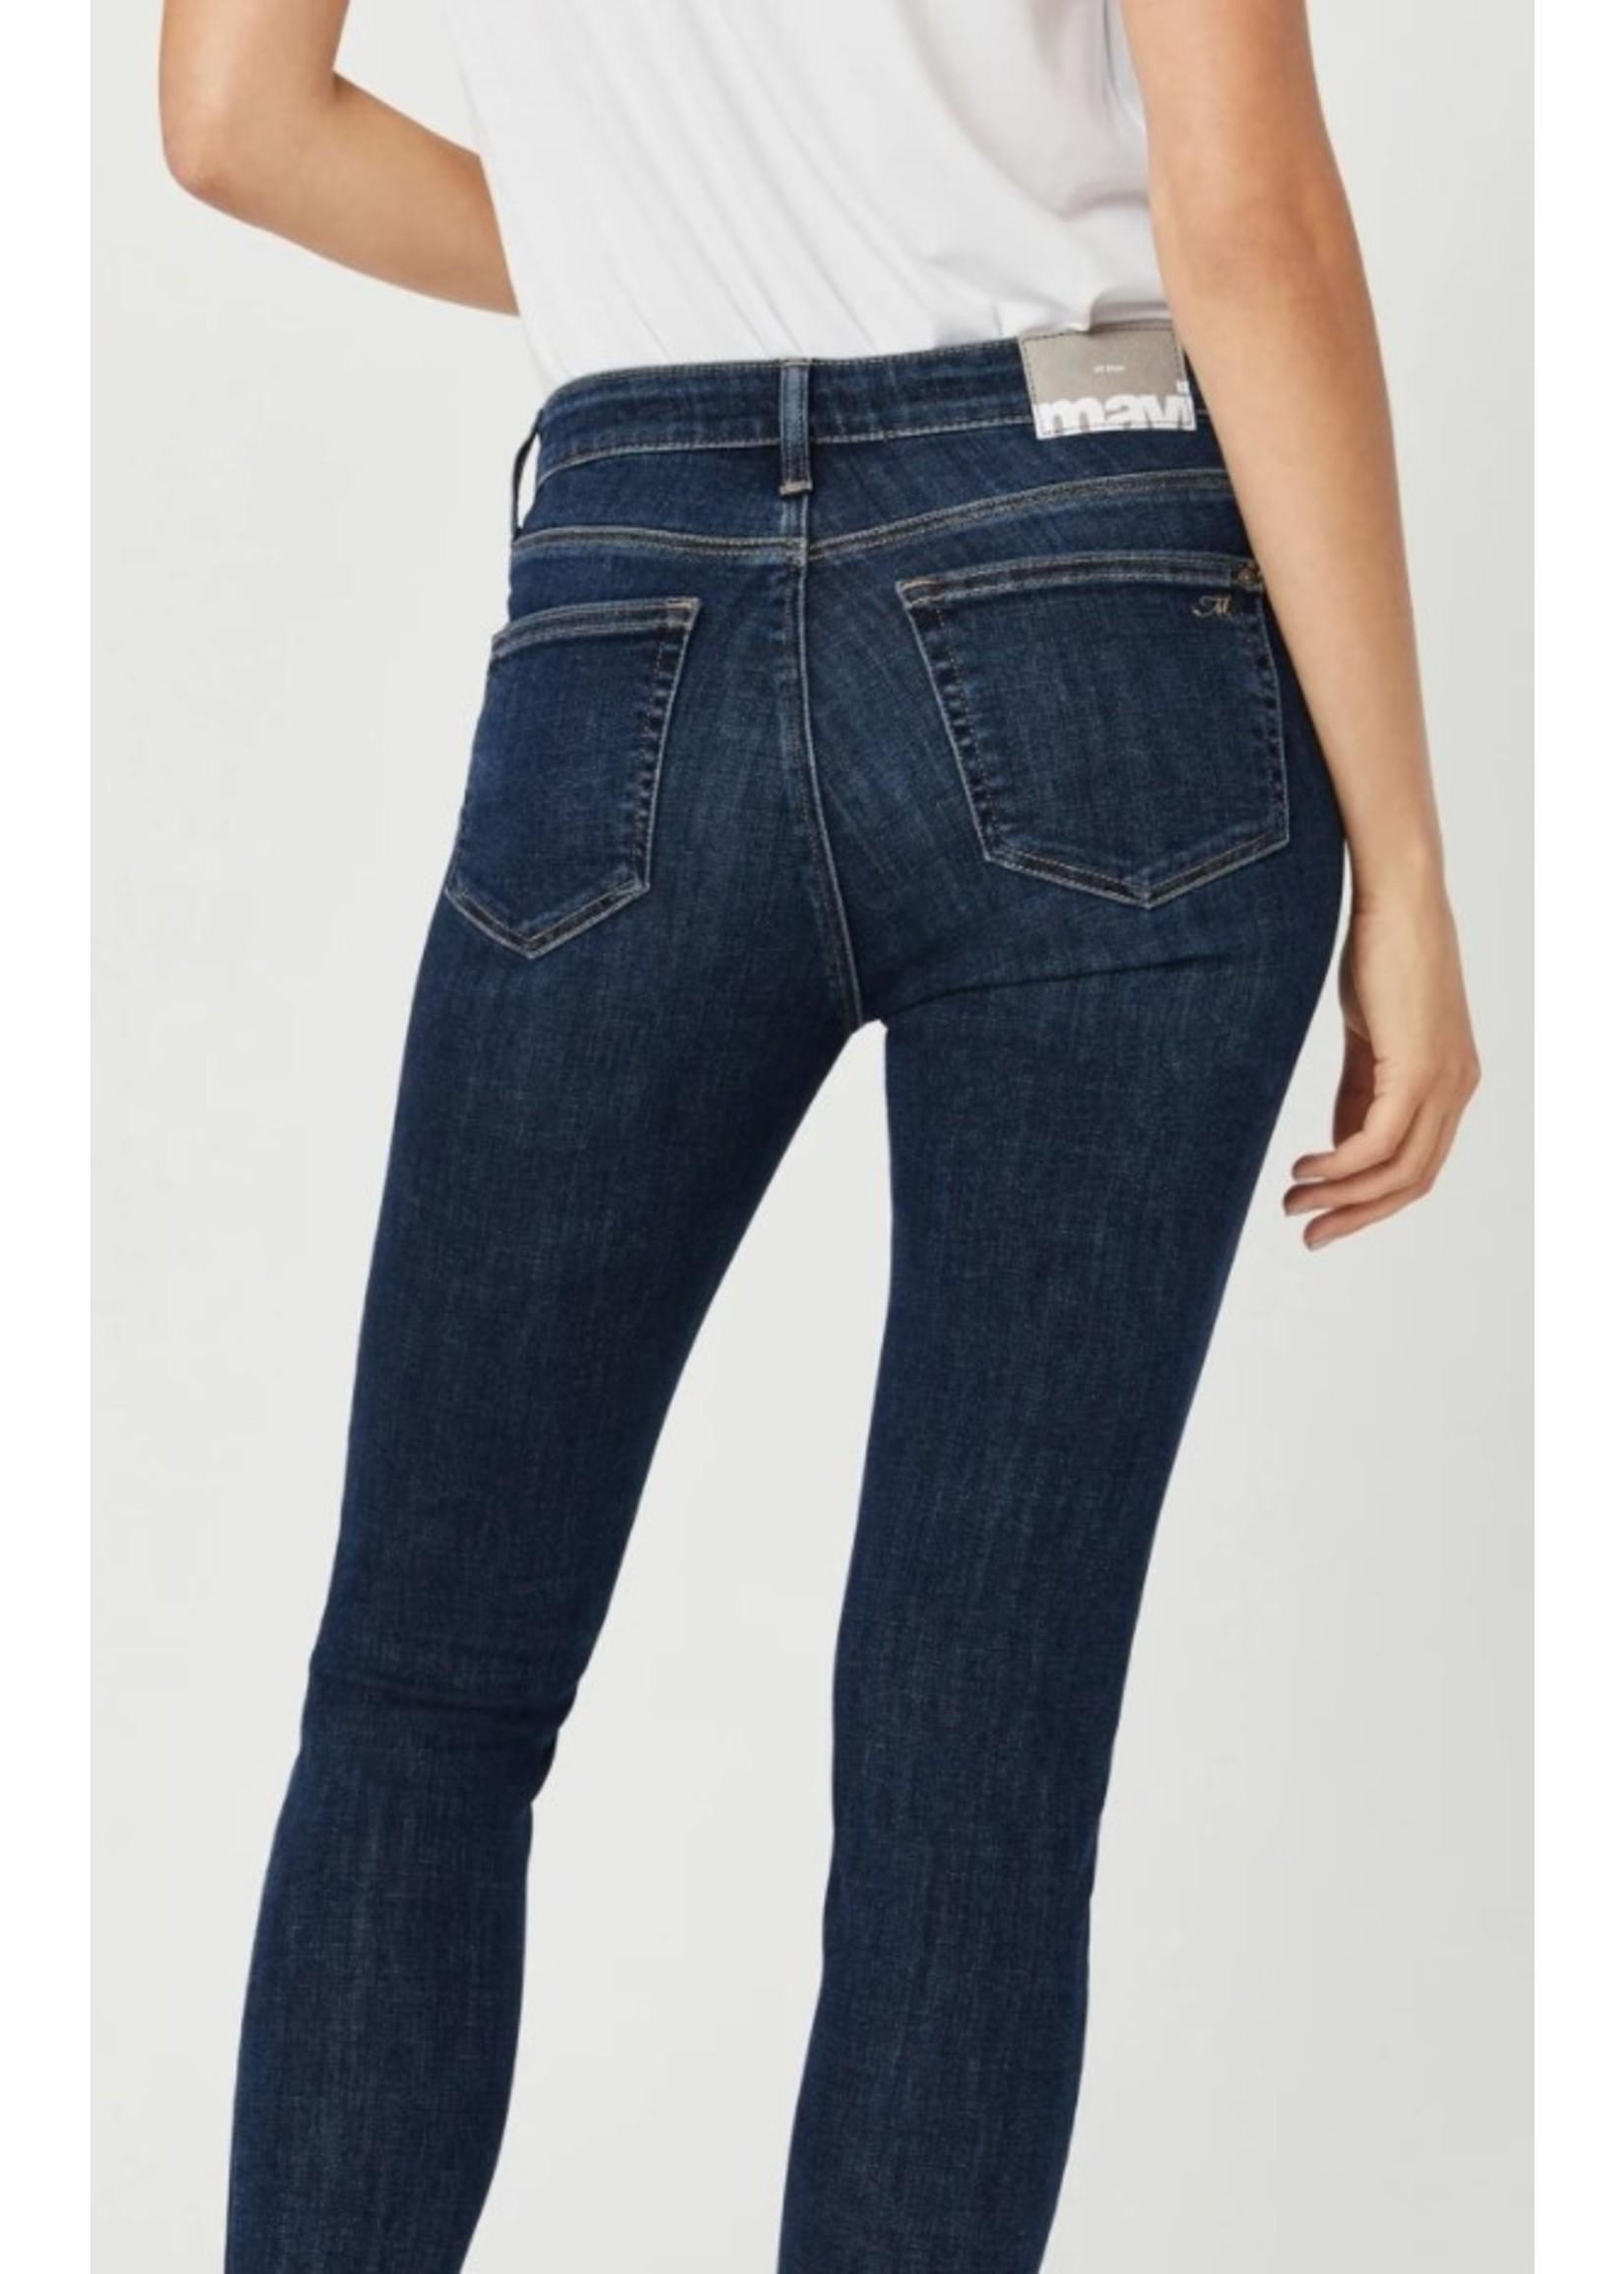 Mavi Jeans Scarlett Deep Feather Blue